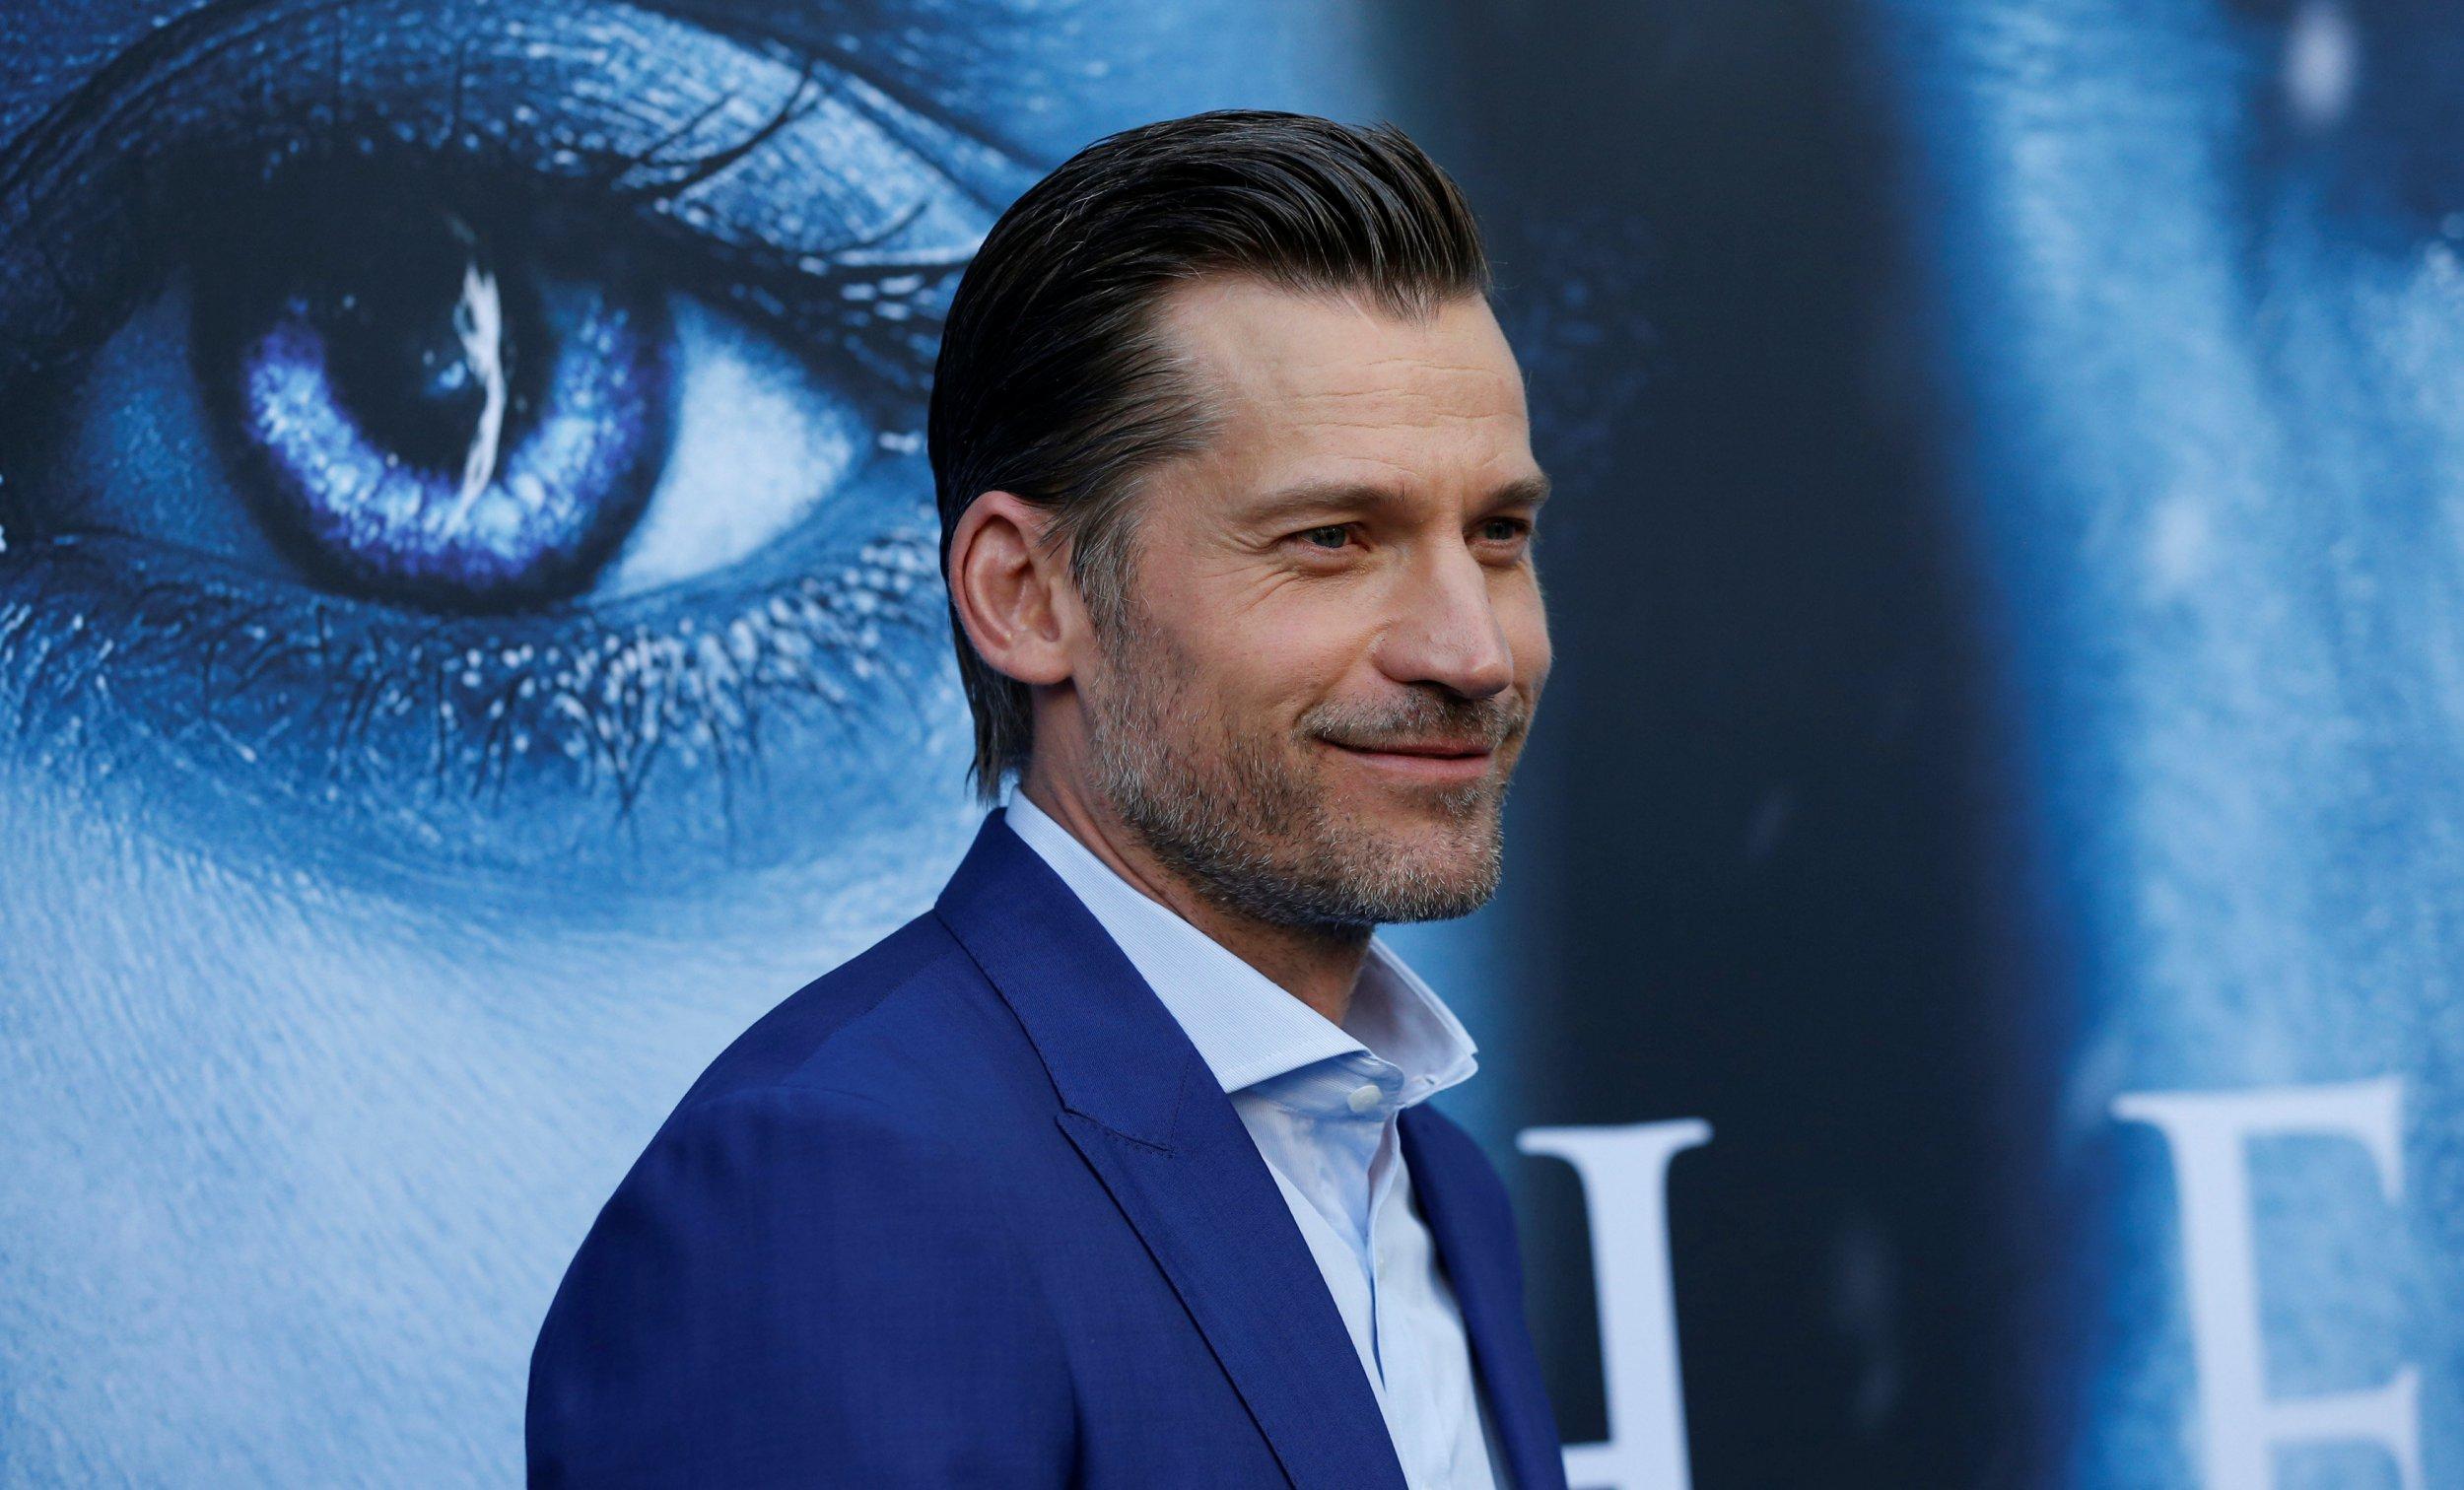 Game of Thrones' Nikolaj Coster-Waldau admits he couldn't watch two 'disturbing' scenes